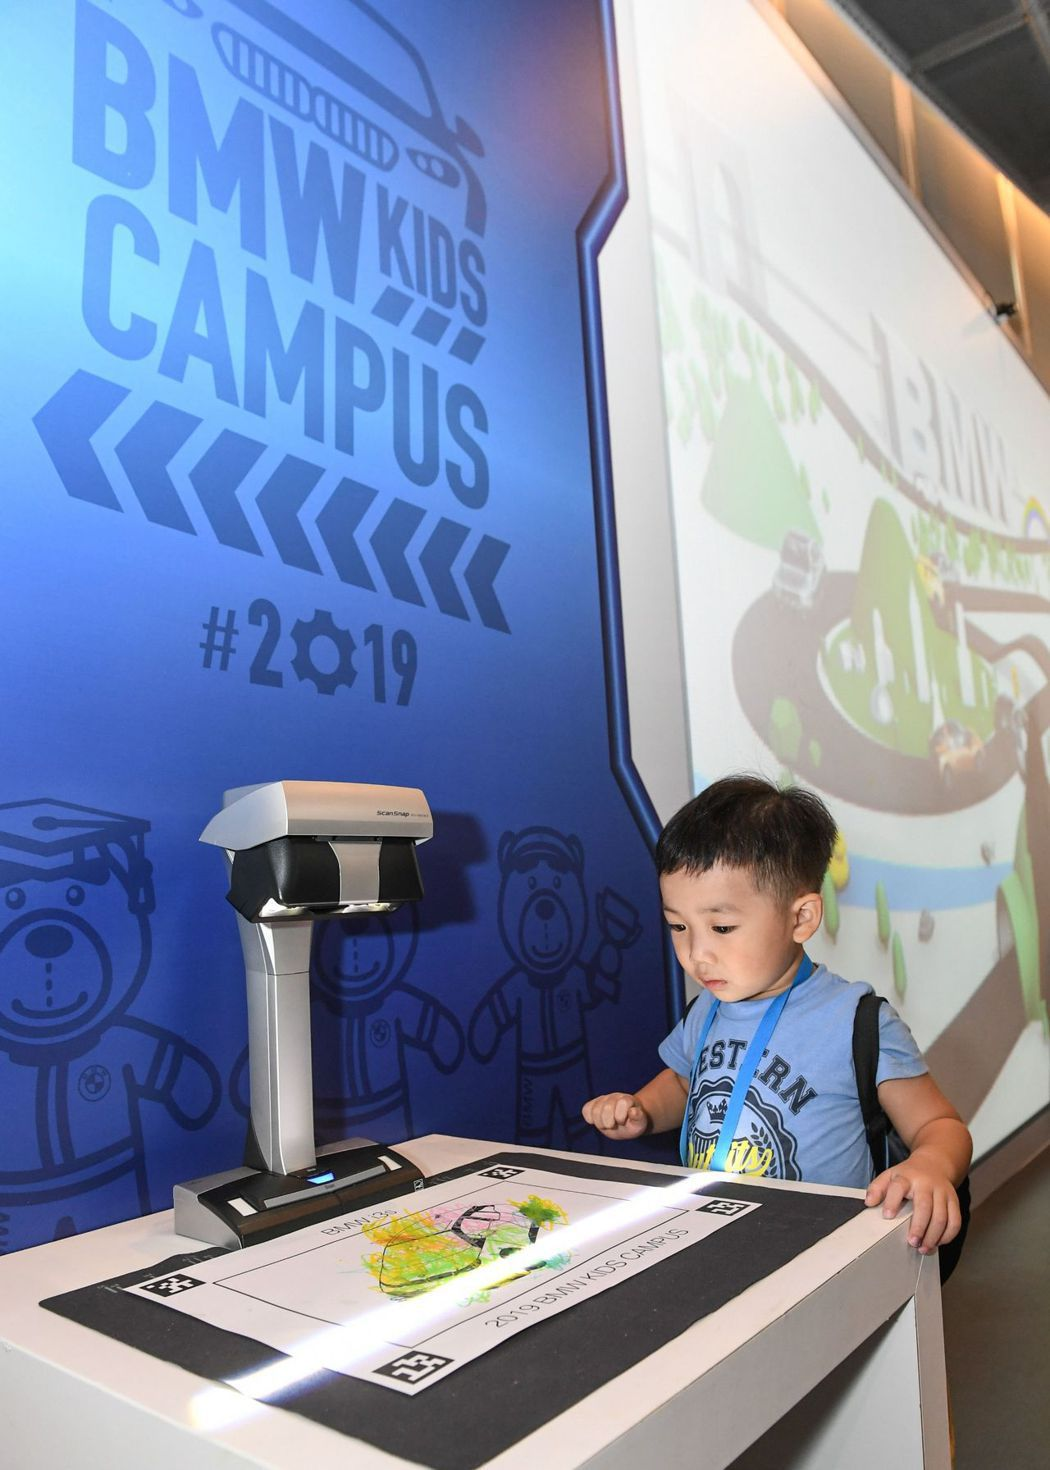 BMW Kids Campus讓孩童在學習新知的同時還可盡情揮灑、展現創意。 圖...